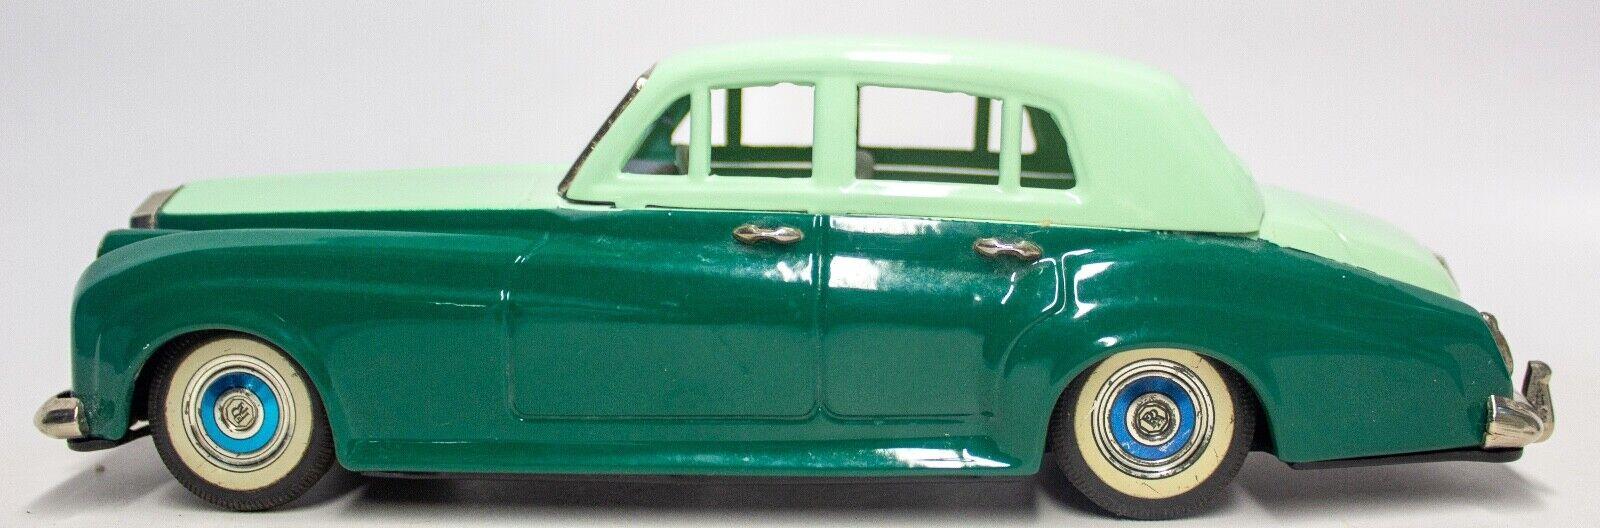 Vintage Knappe Japanisch Dose Reibung 597mS Rolls Royce Silber Wolke 4-DOOR Limo